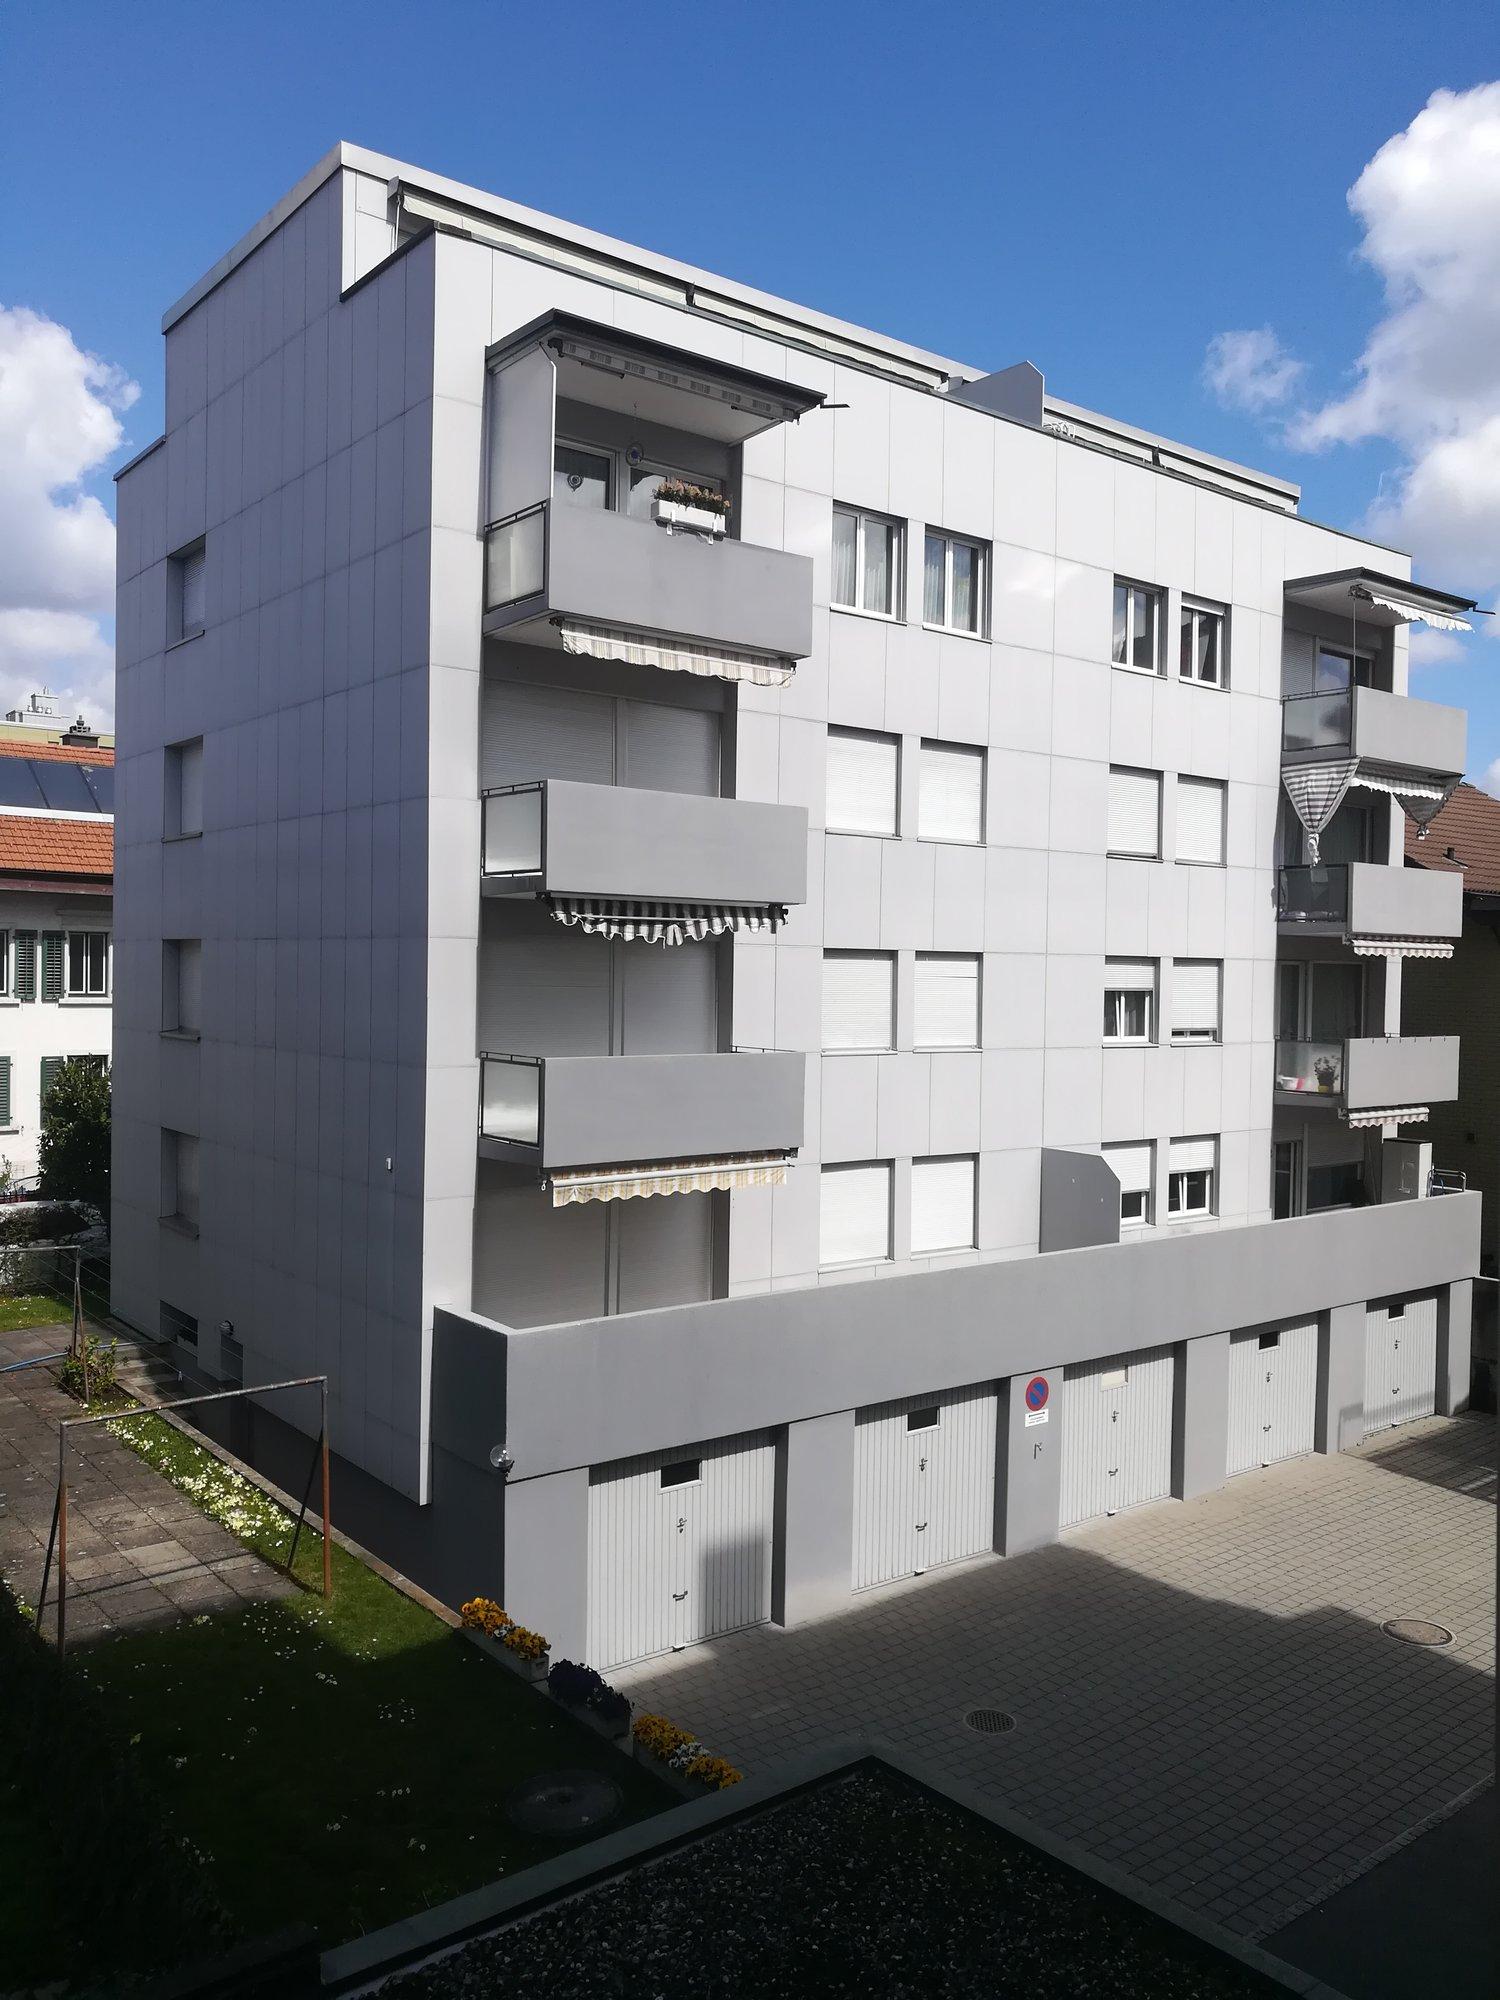 Fährstrasse 28